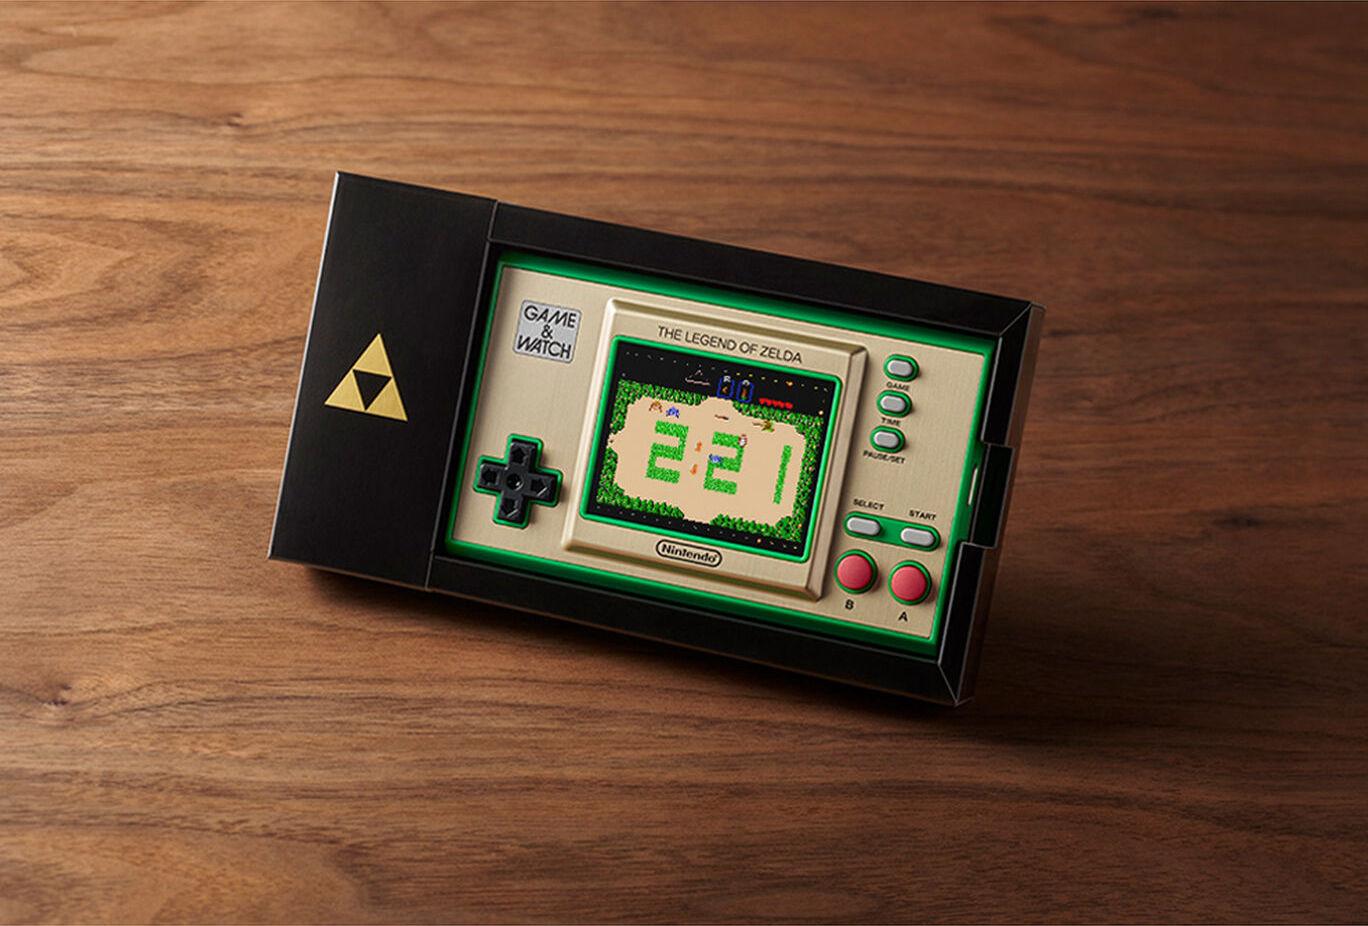 Zelda Game & Watch Features Multi-Language Option